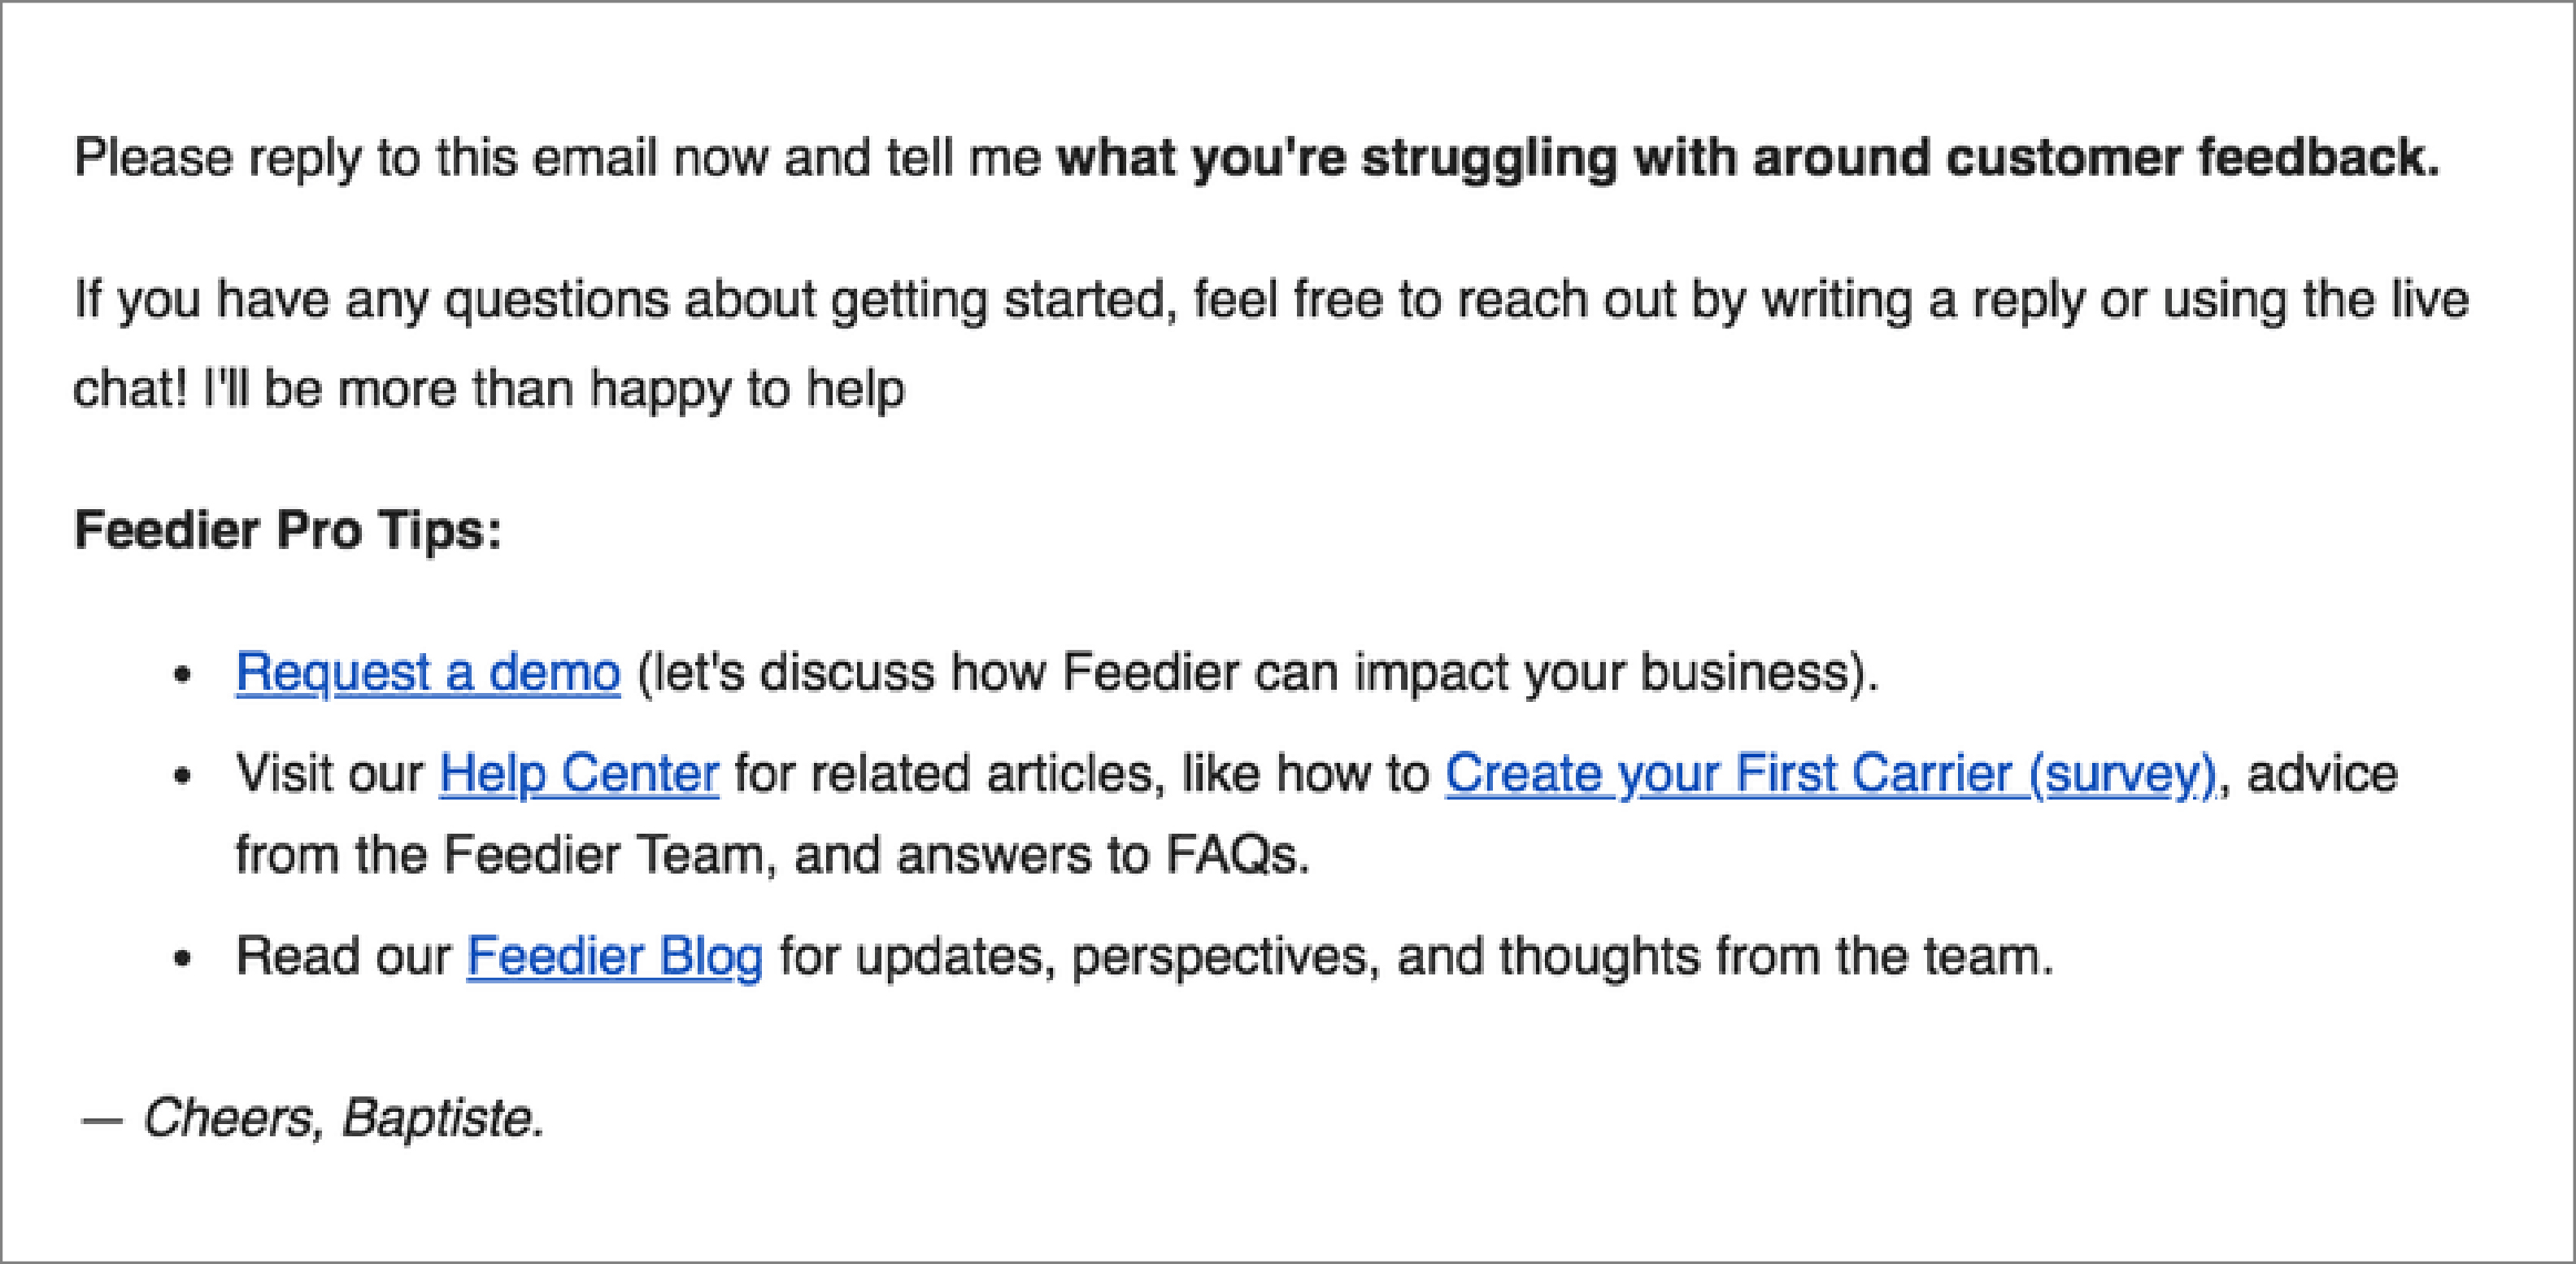 Feedier's Personalized Email Marketing | WebEngage